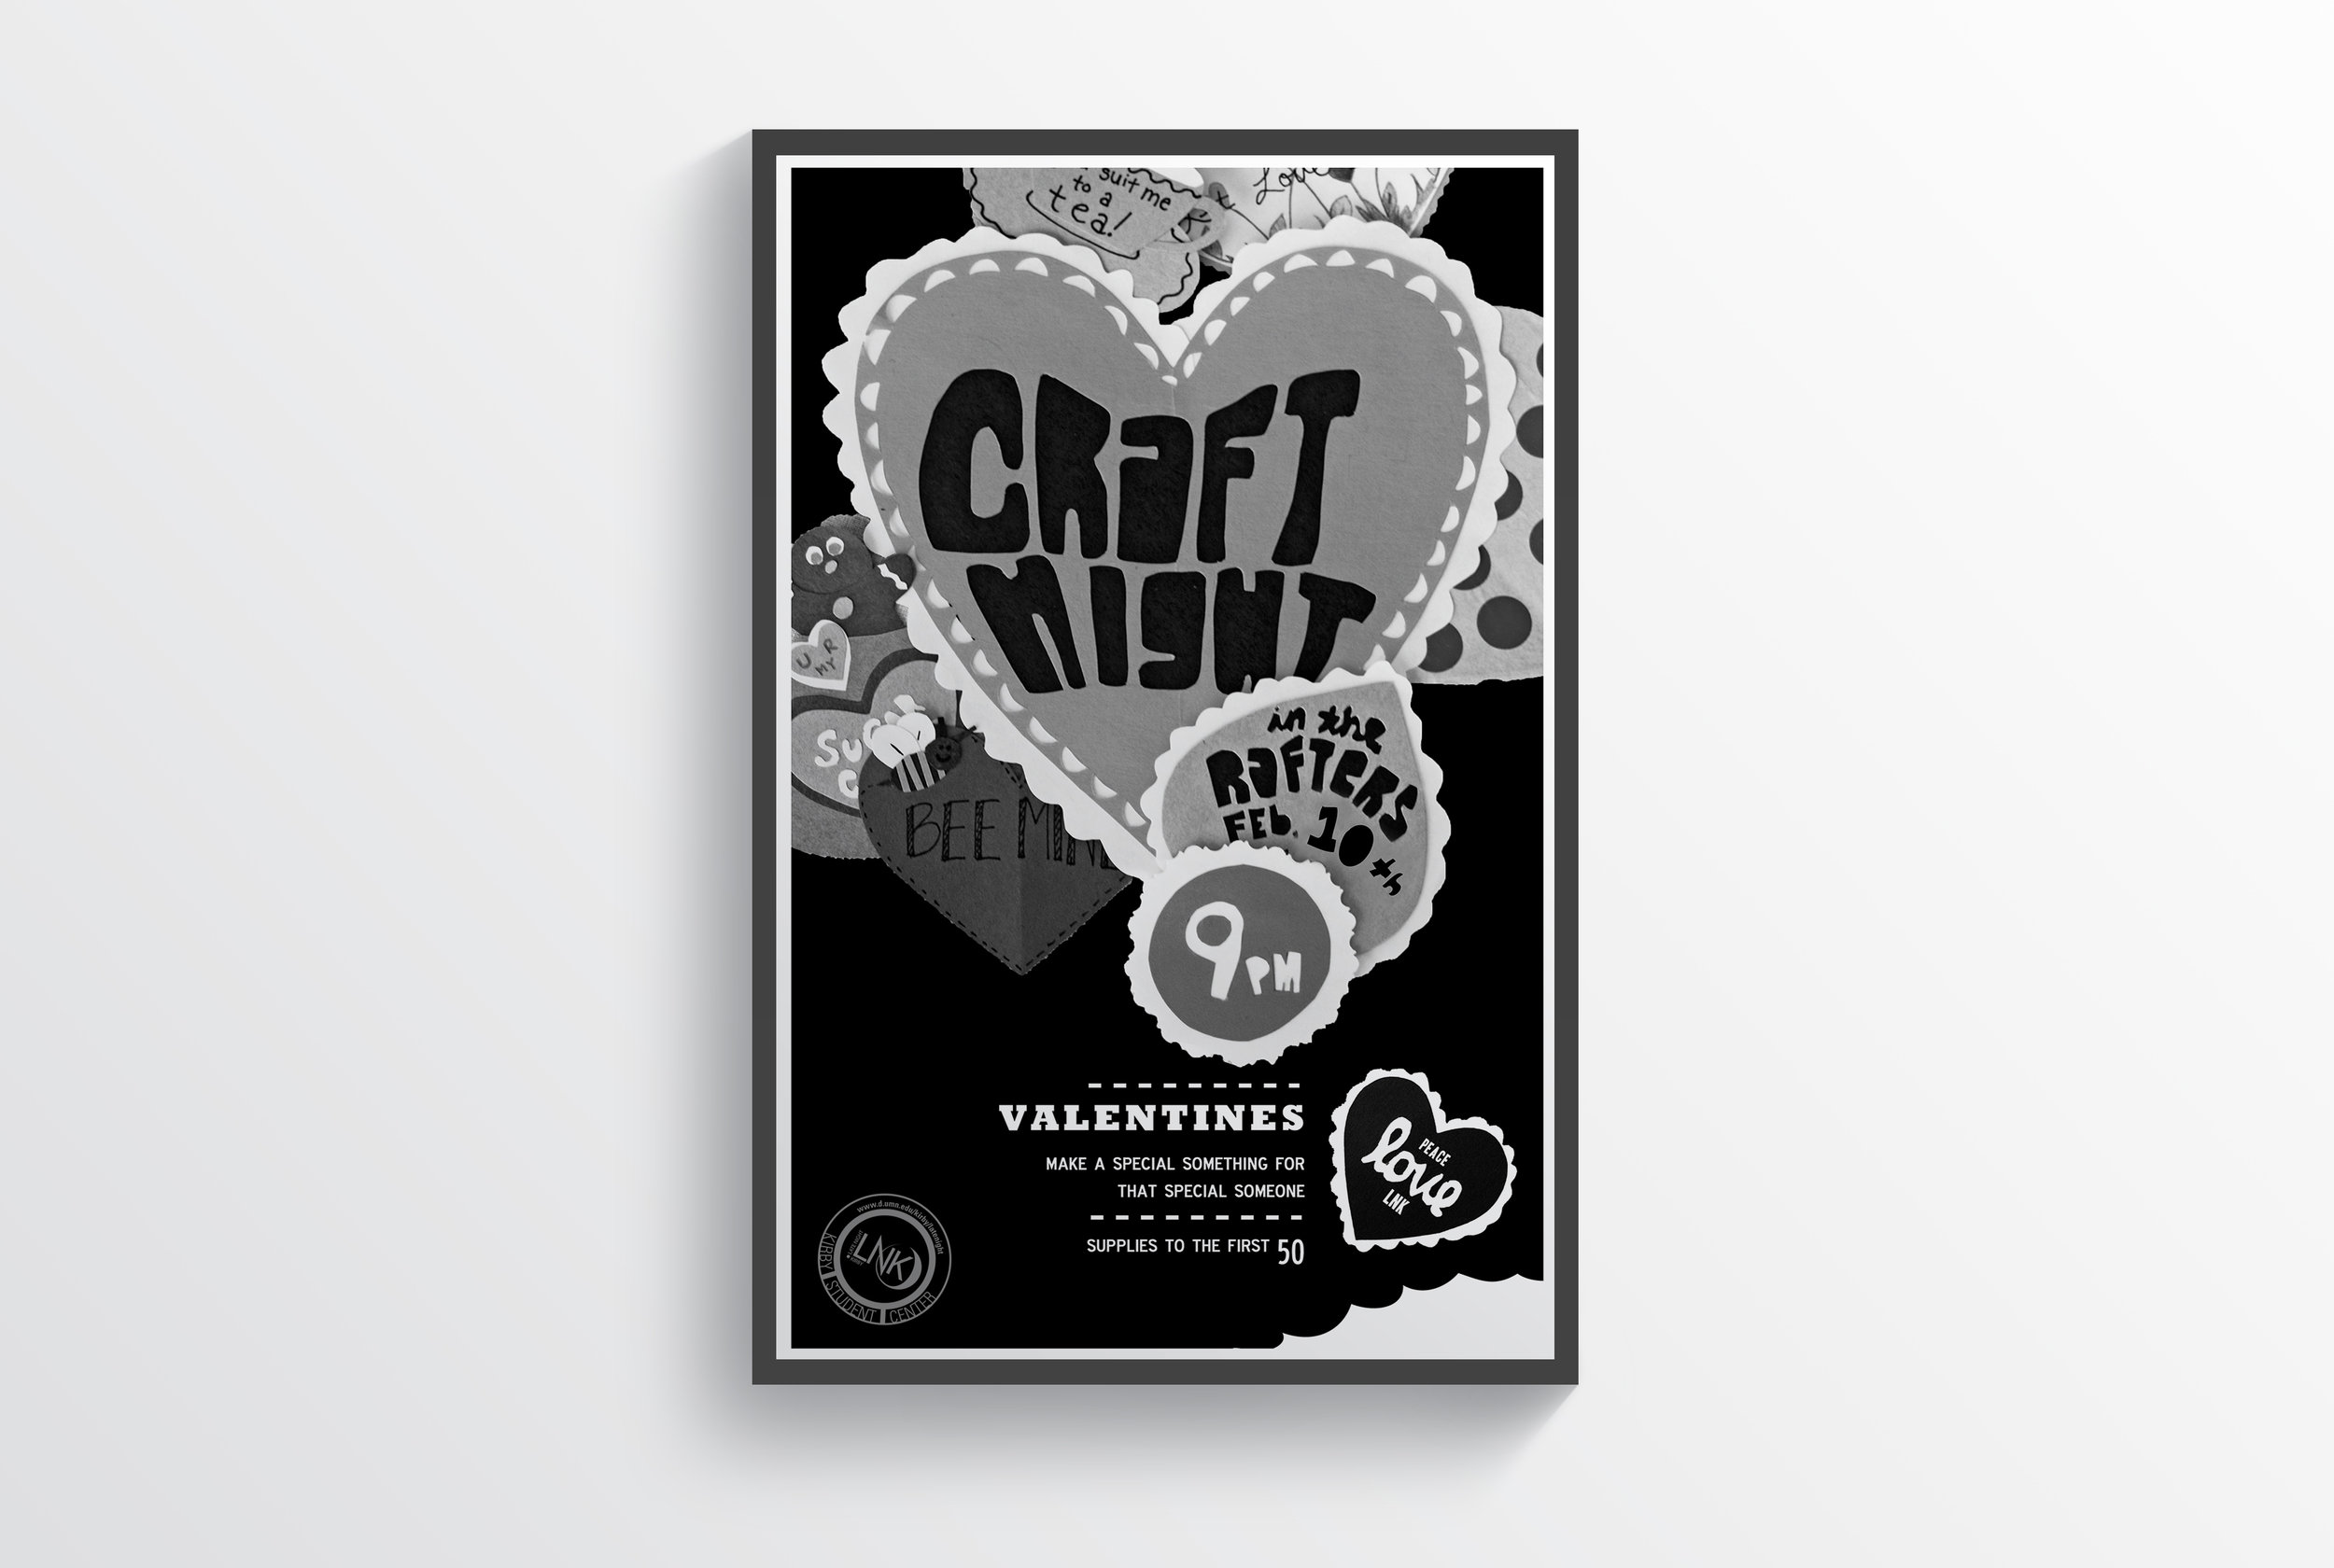 CraftNight_2_bw.jpg